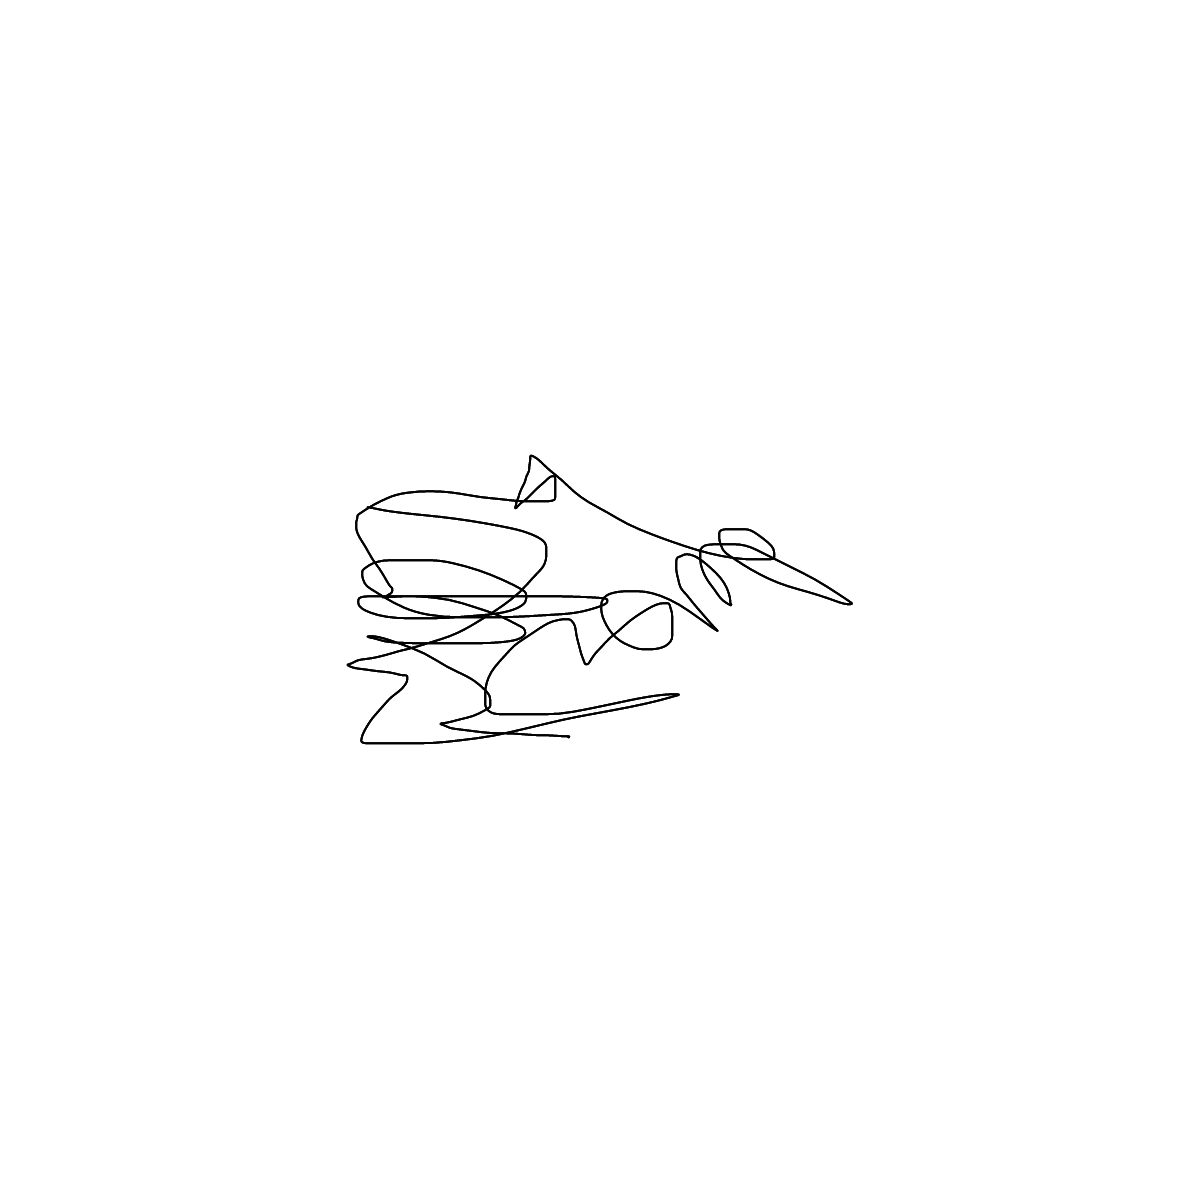 BAAAM drawing#18686 lat:52.0846824645996100lng: 5.1685929298400880